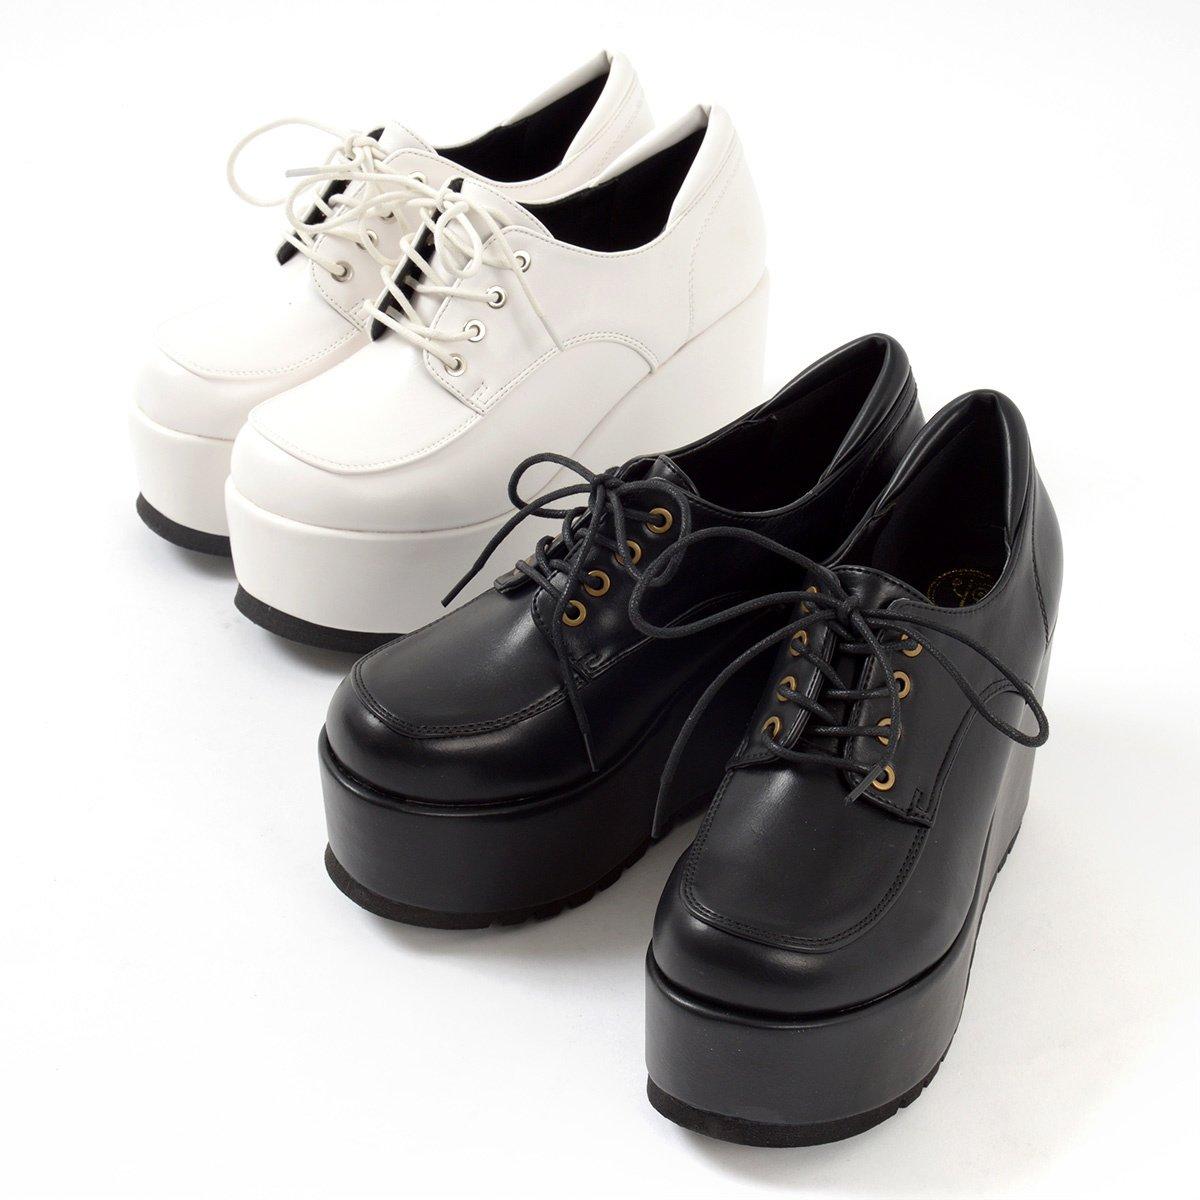 a6c60104d5a YOSUKE USA Platform Lace-Up Shoes